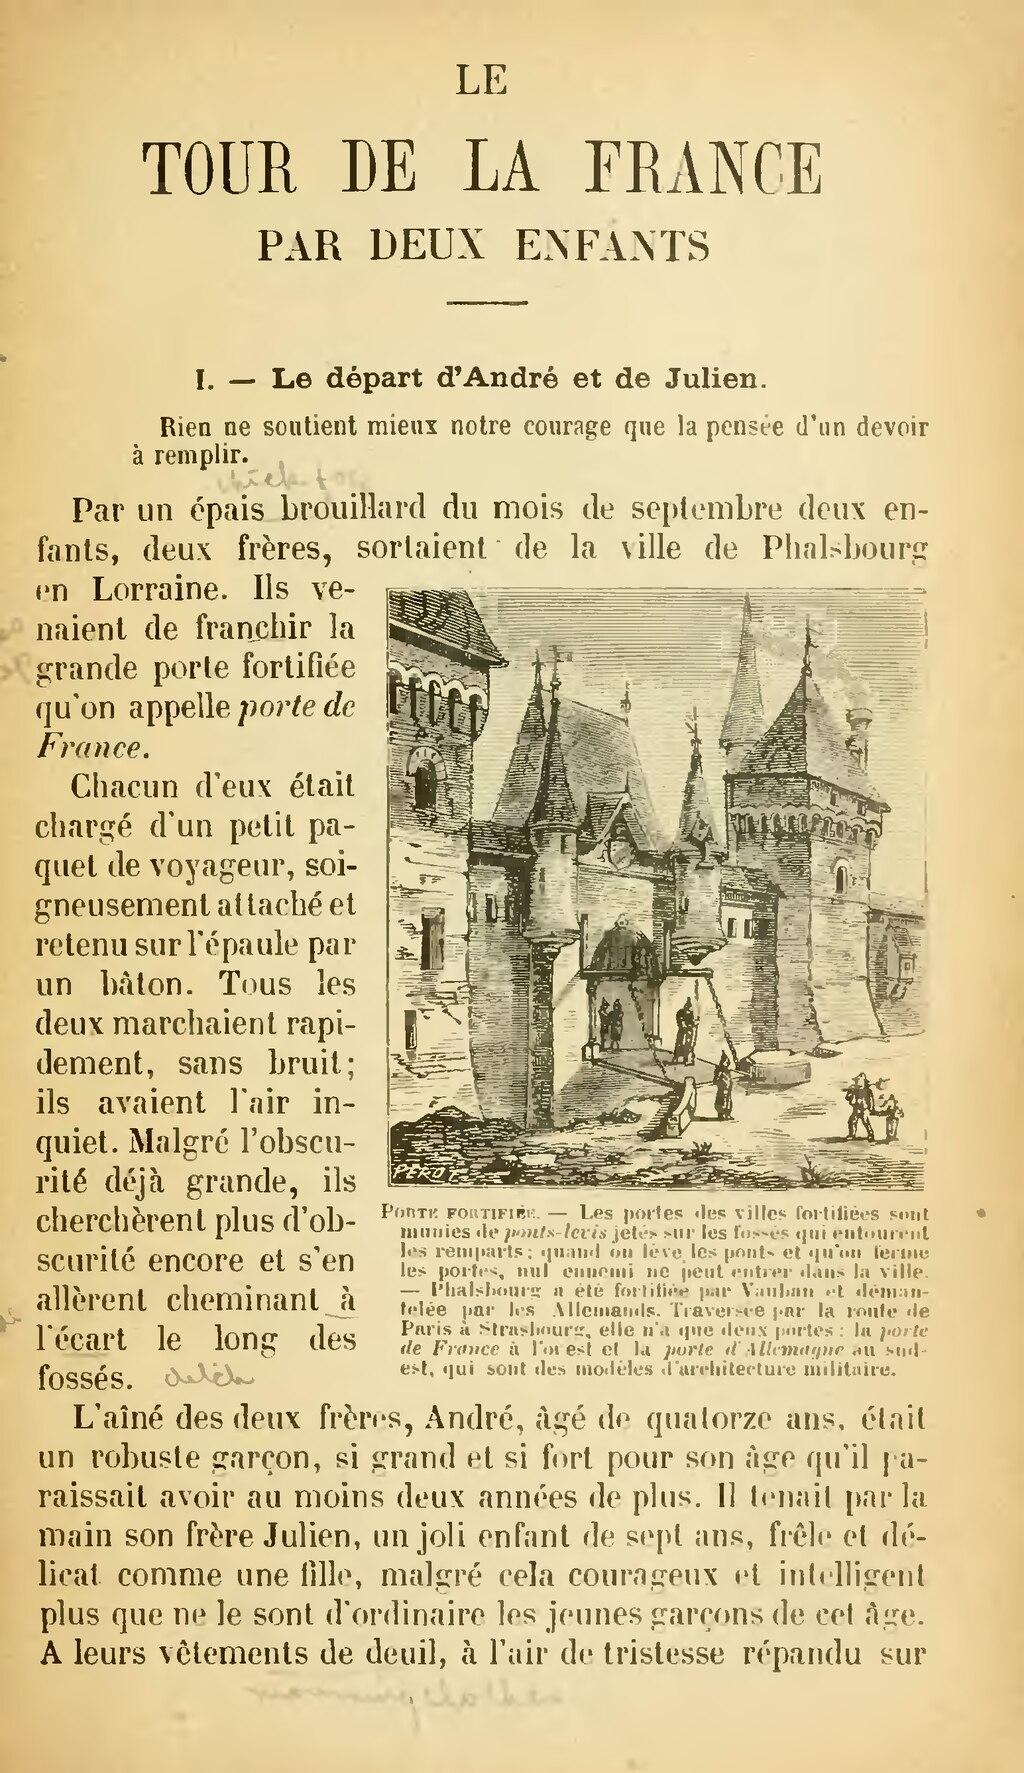 Le Tour De France Par Deux Enfants : france, enfants, Page:G., Bruno, France, Enfants,, 1904.djvu/7, Wikisource